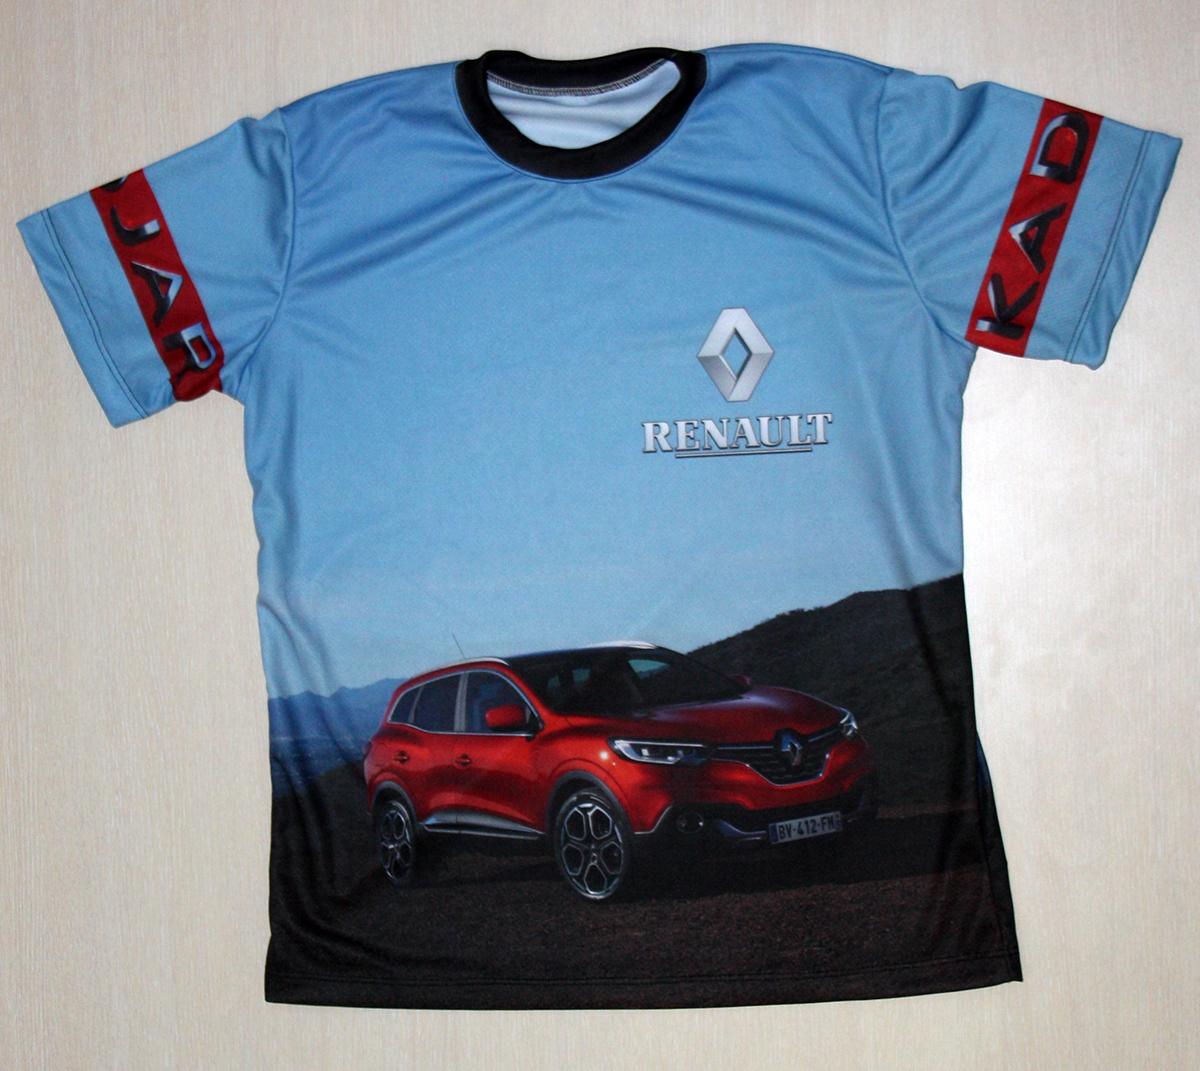 Renault Kadjar T Shirt With Logo And All Over Printed